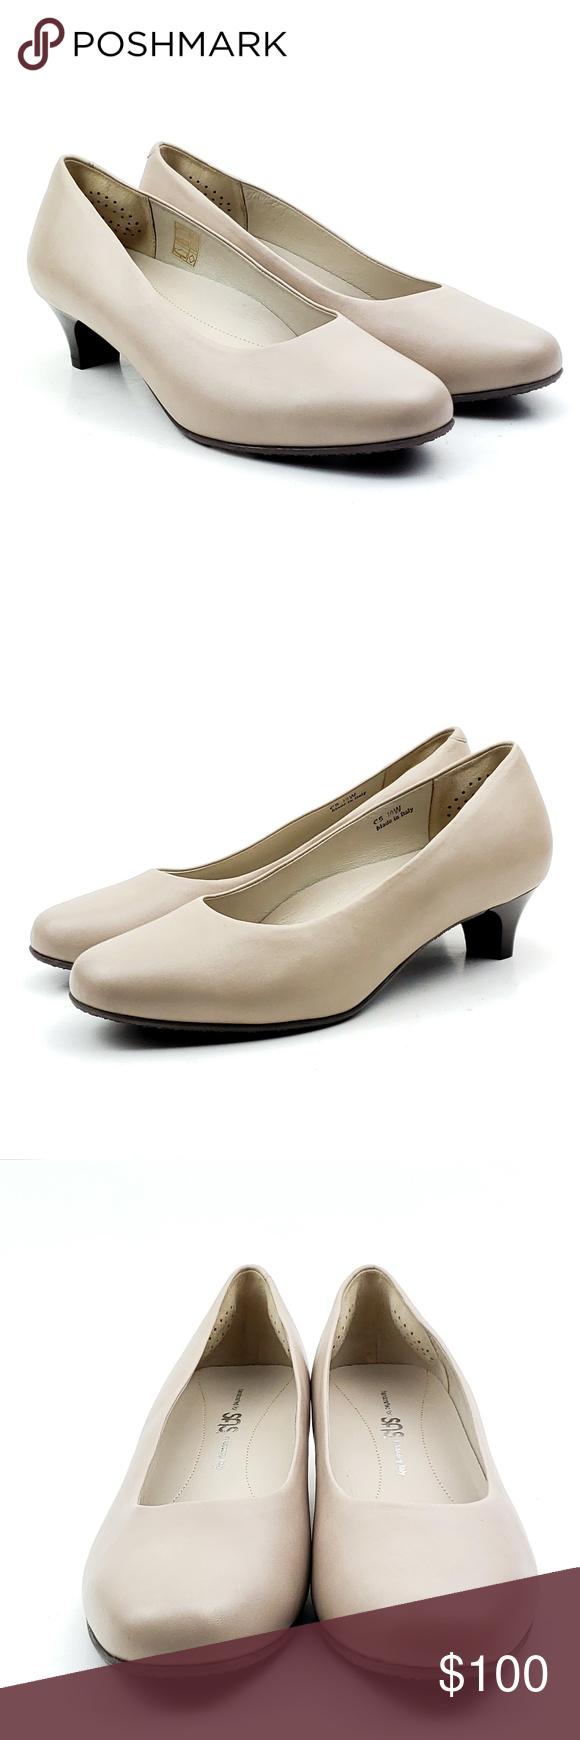 New Sas Elaine Beige Round Toe Italian Heels Sas Model Elaine Womens Color Beige Mfg Color Mushroom Material Lea Italian Heels Round Toe Pumps Heels